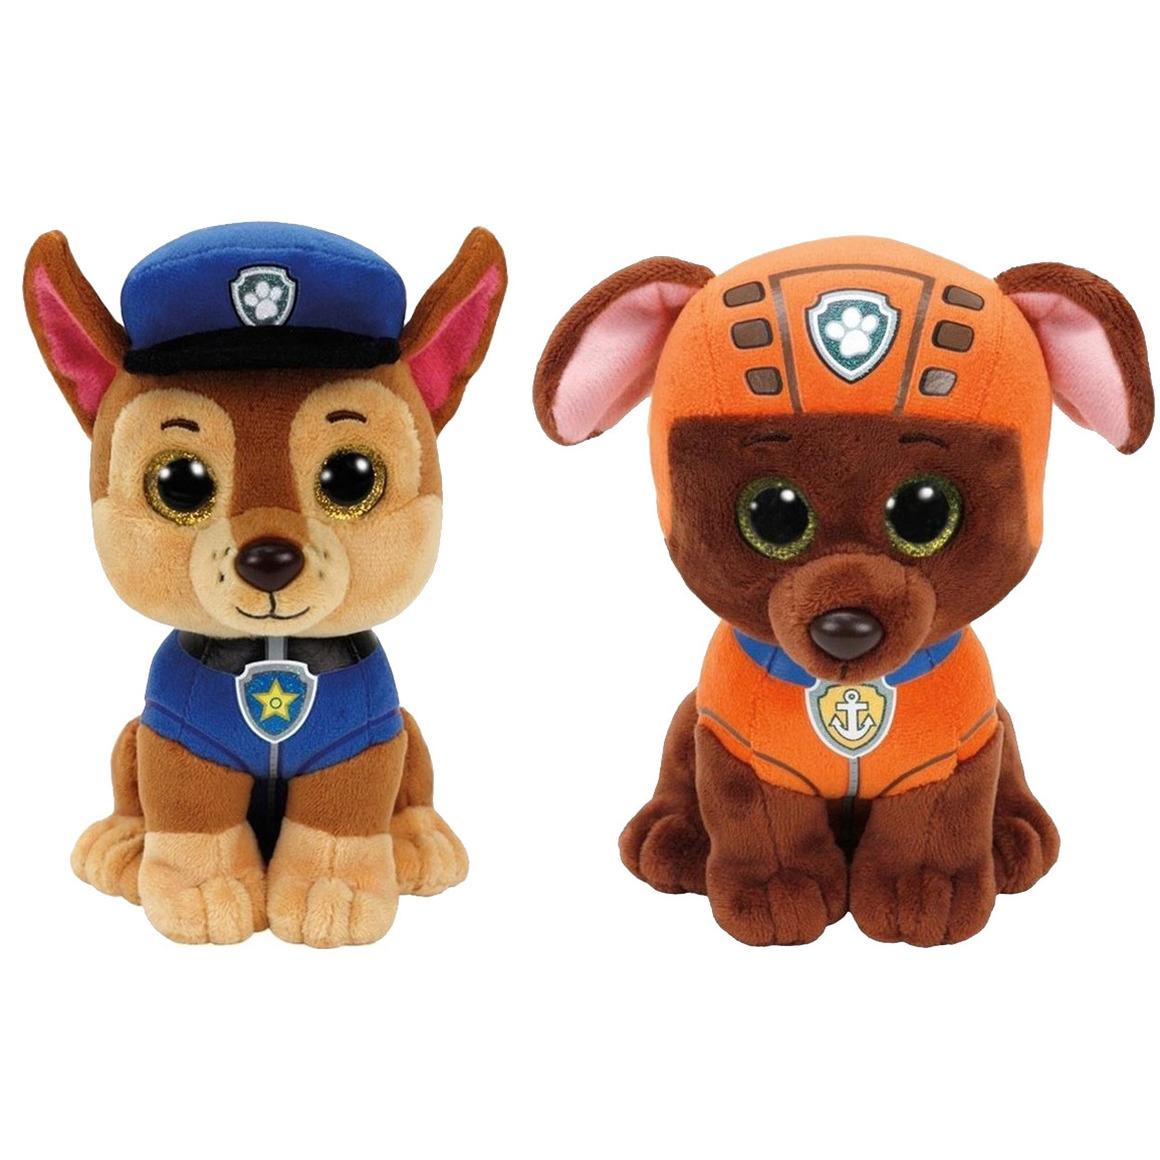 Paw Patrol knuffels set van 2x karakters Chase en Zuma 15 cm